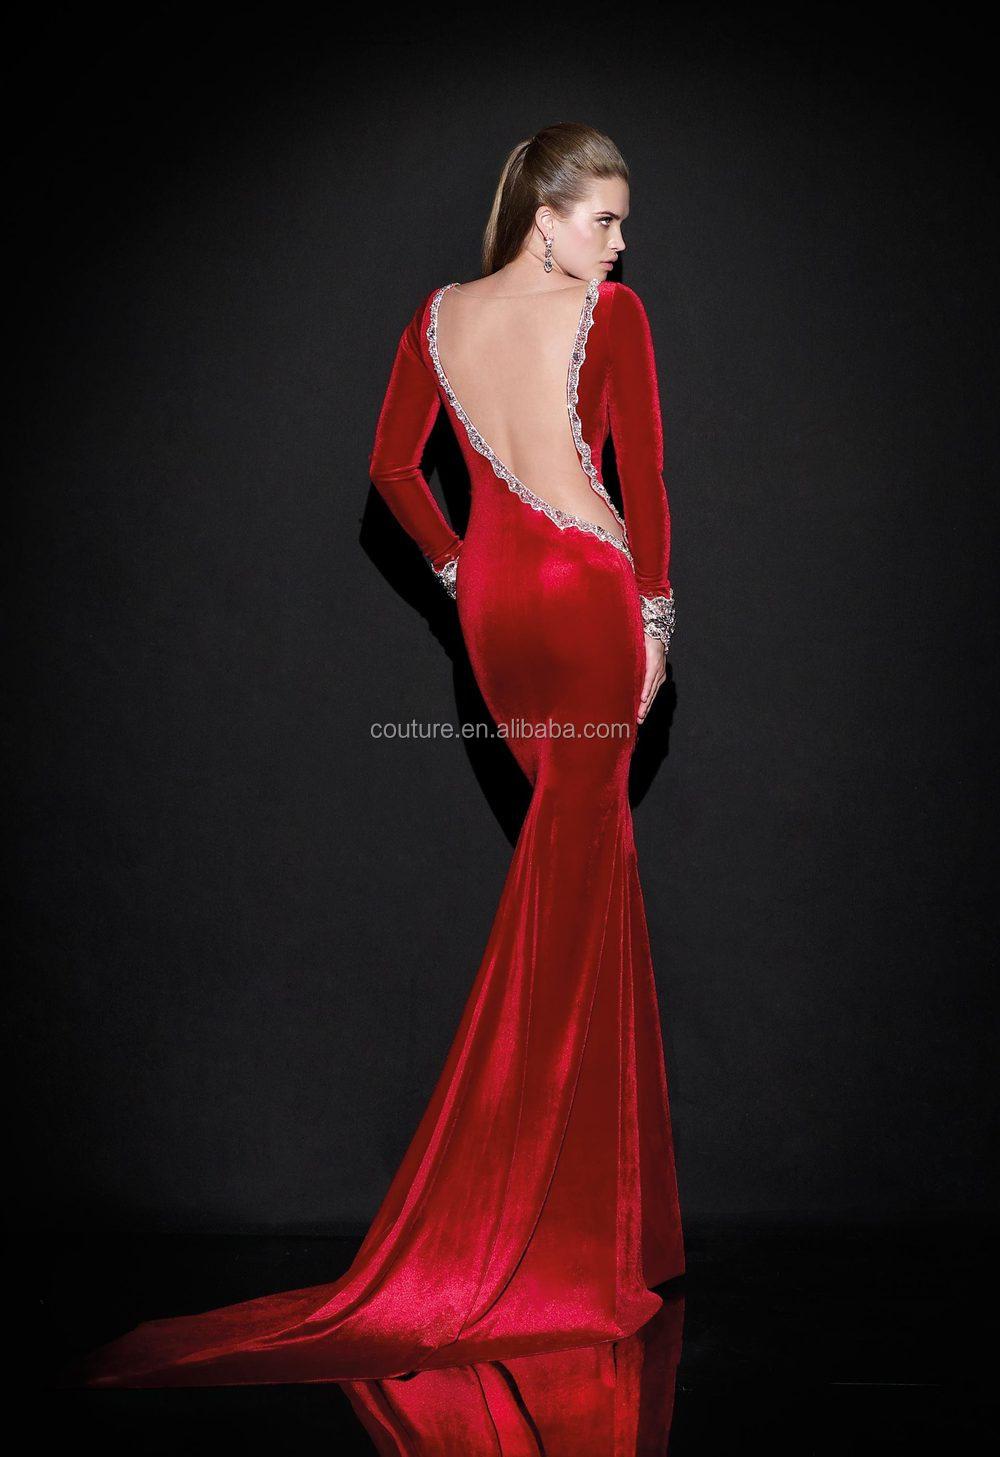 Robe soiree 2015 longue rouge